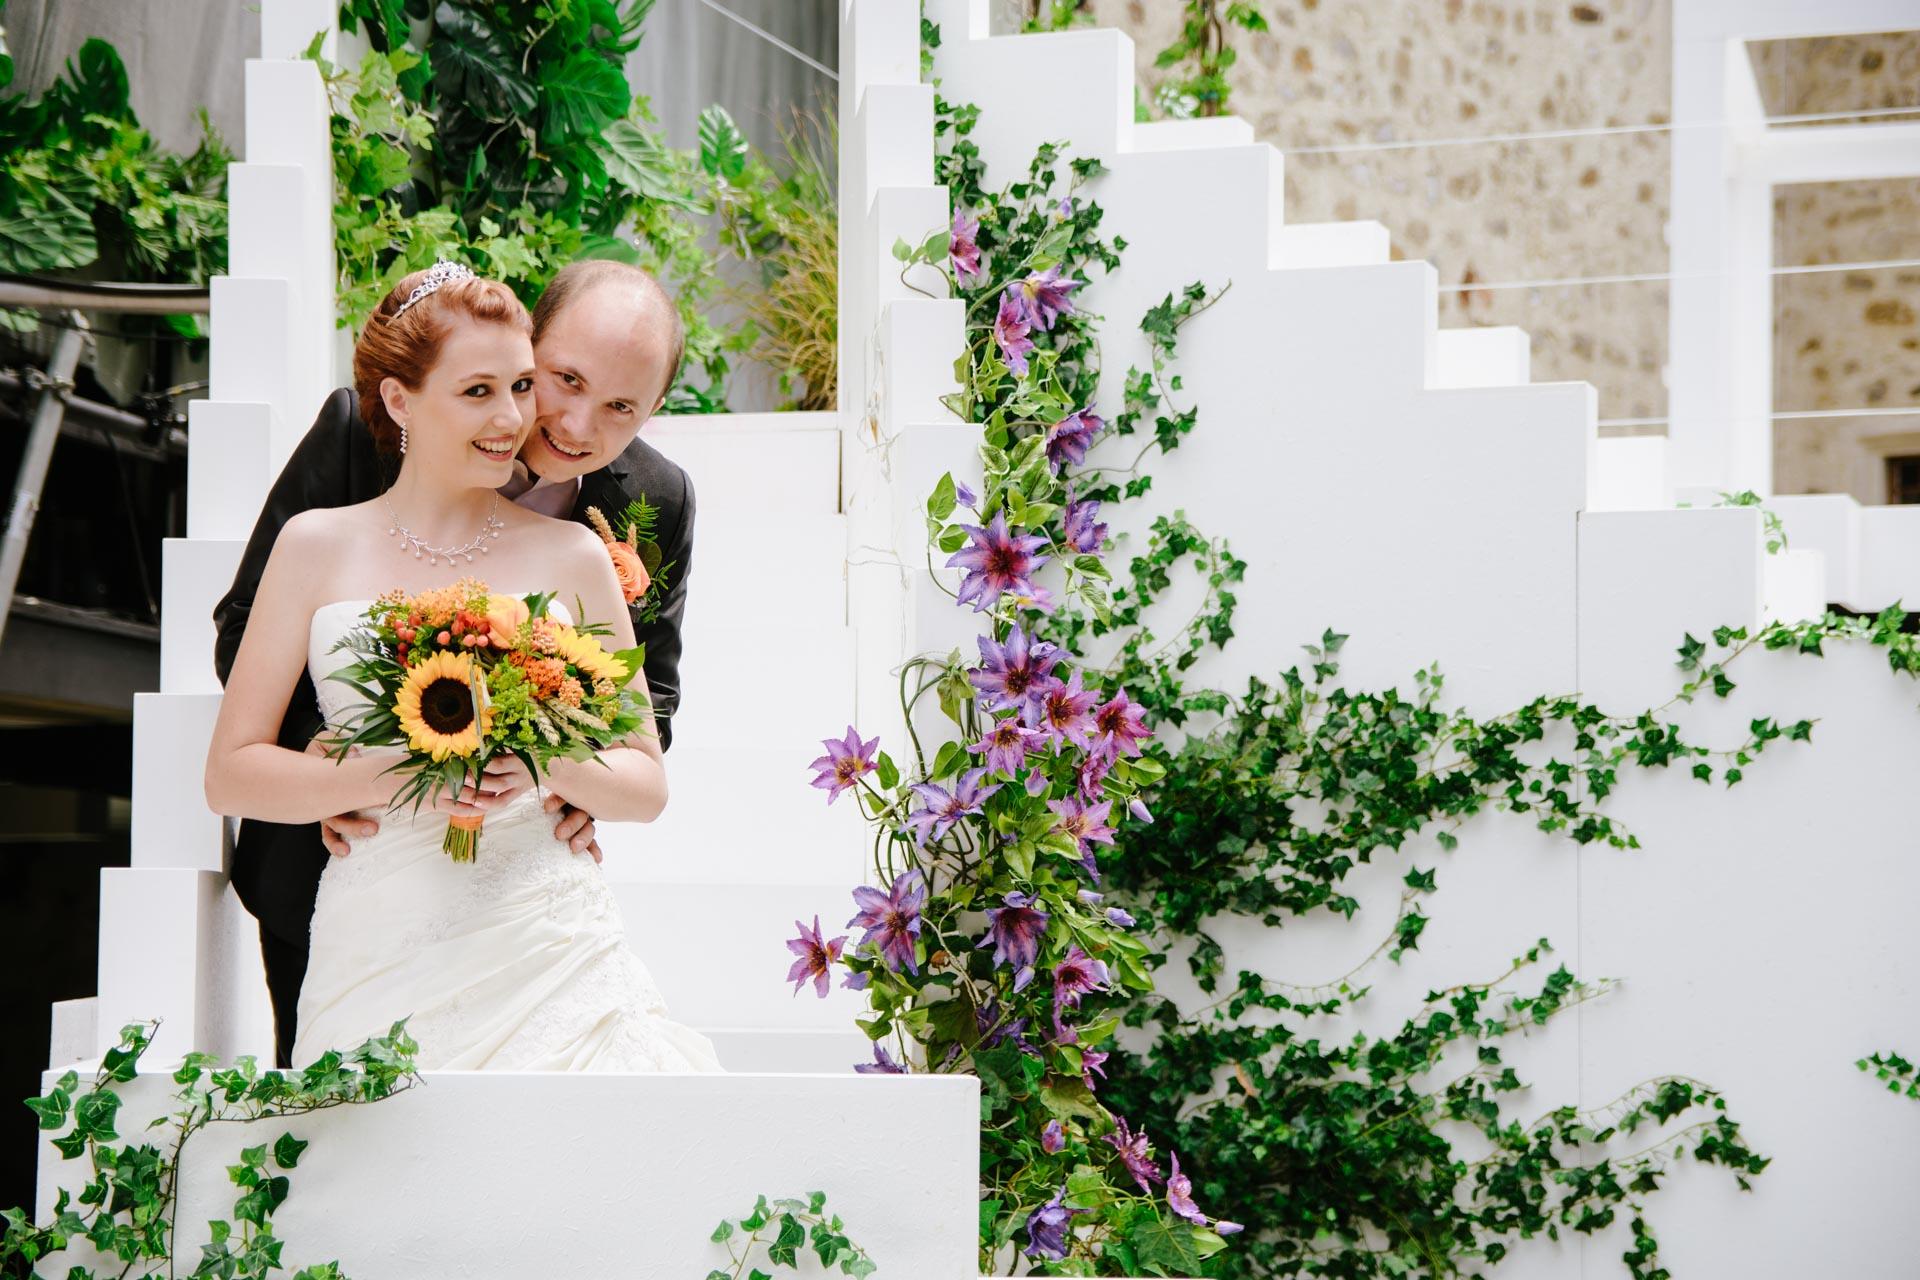 Pixelart_Hochzeitsfotografen_Loerrach_Rheinfelden_Hallwil_Schweiz_Linda-Ramon-1006